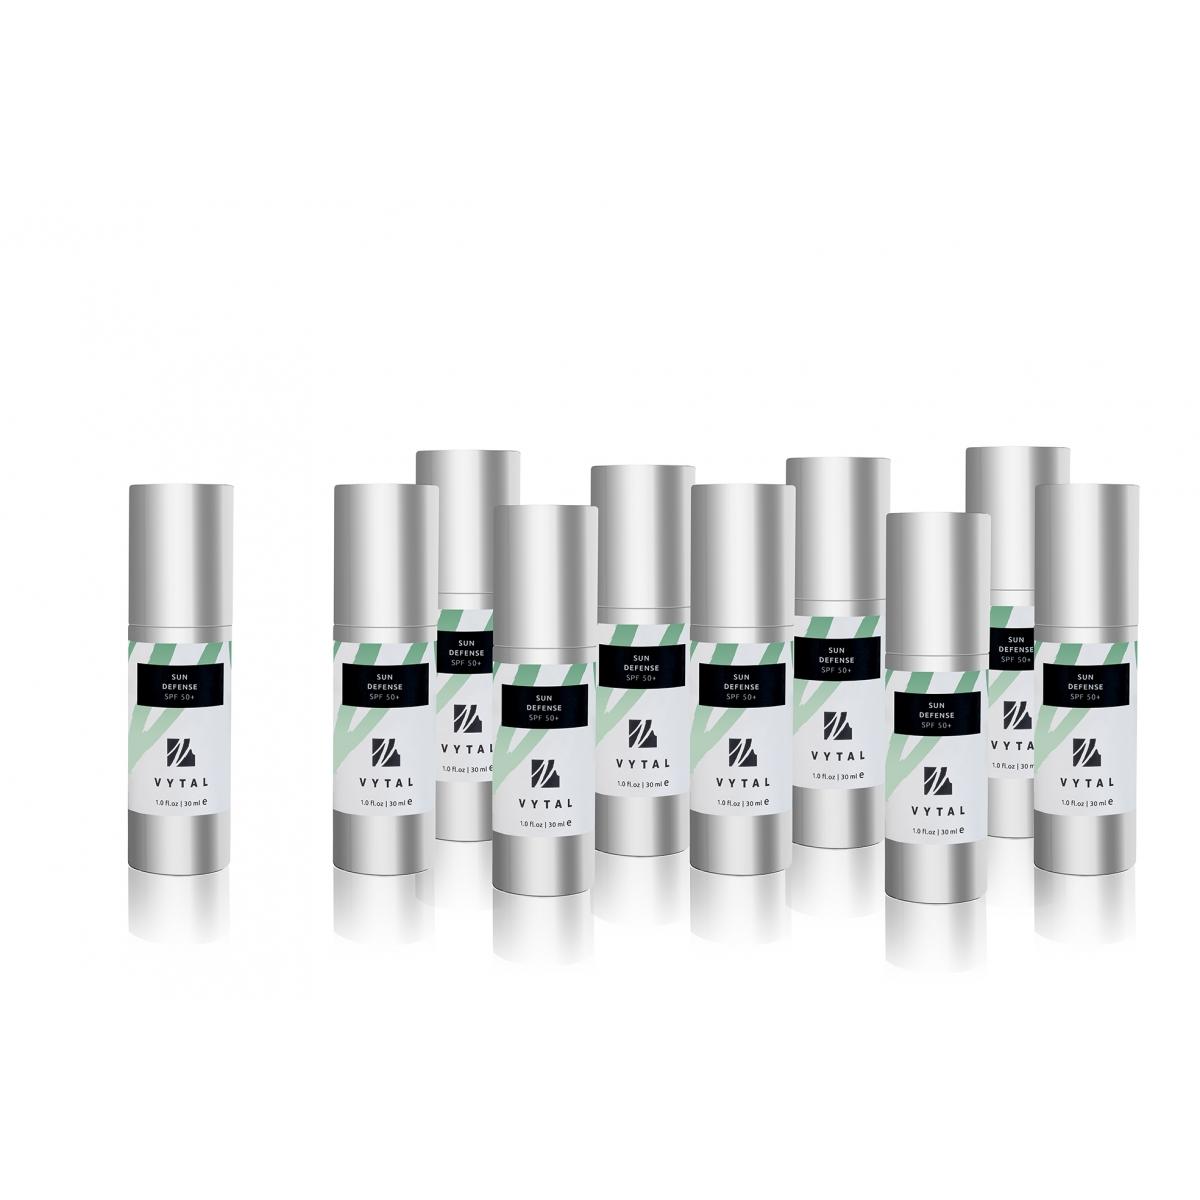 SOIN DU VISAGE - CREME PROTECTION SOLAIRE VYTAL SKIN UV50+ (30 ml) (x10)